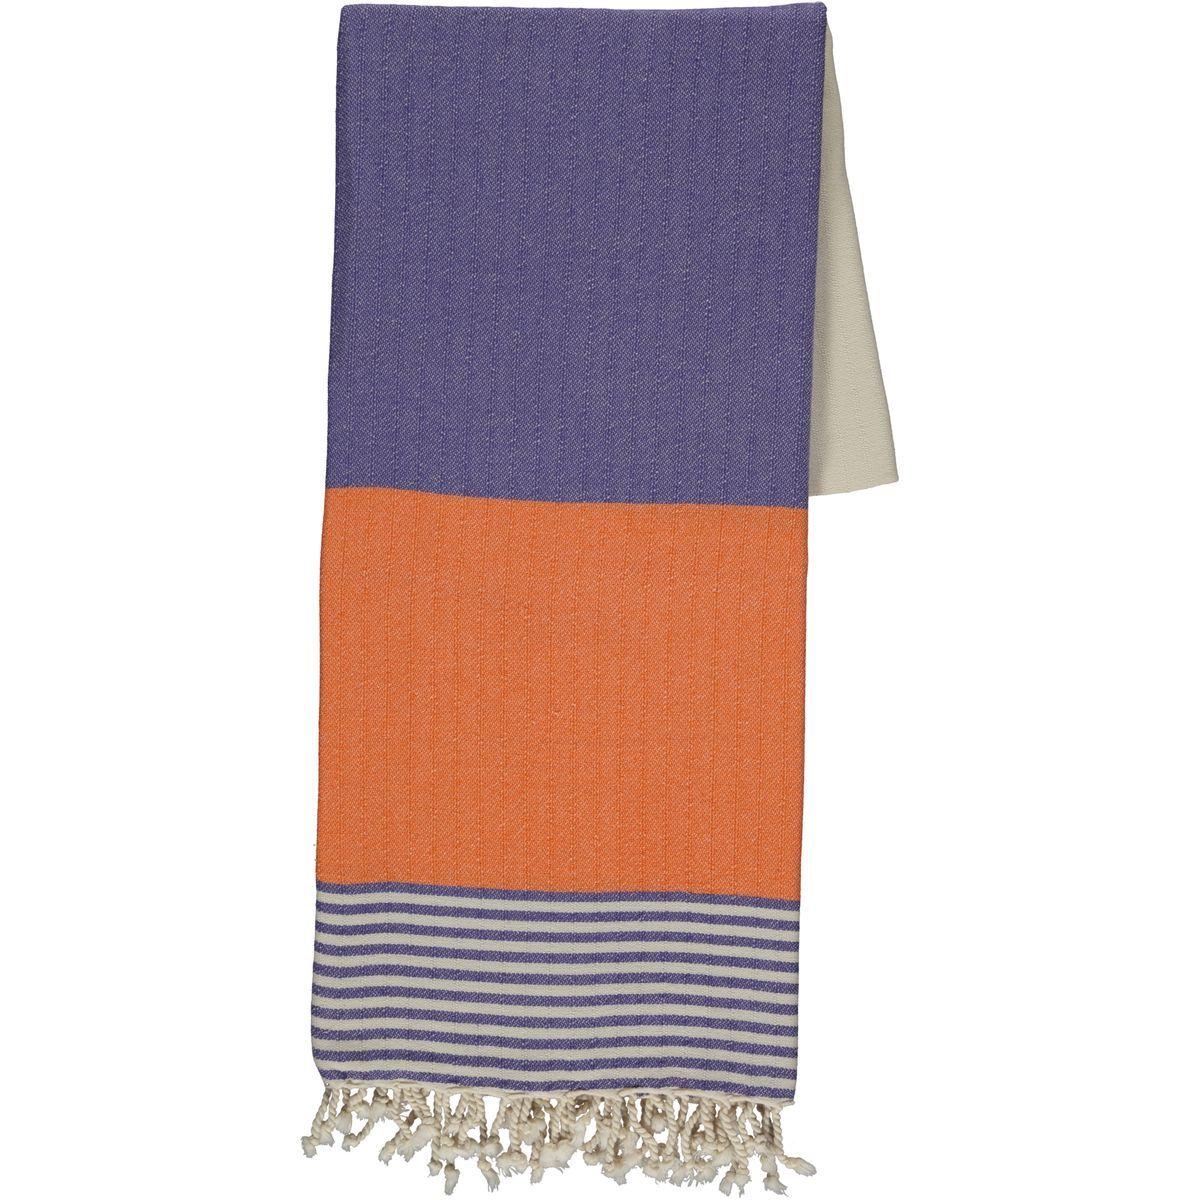 Peshtemal Twin Sultan - Violet / Orange